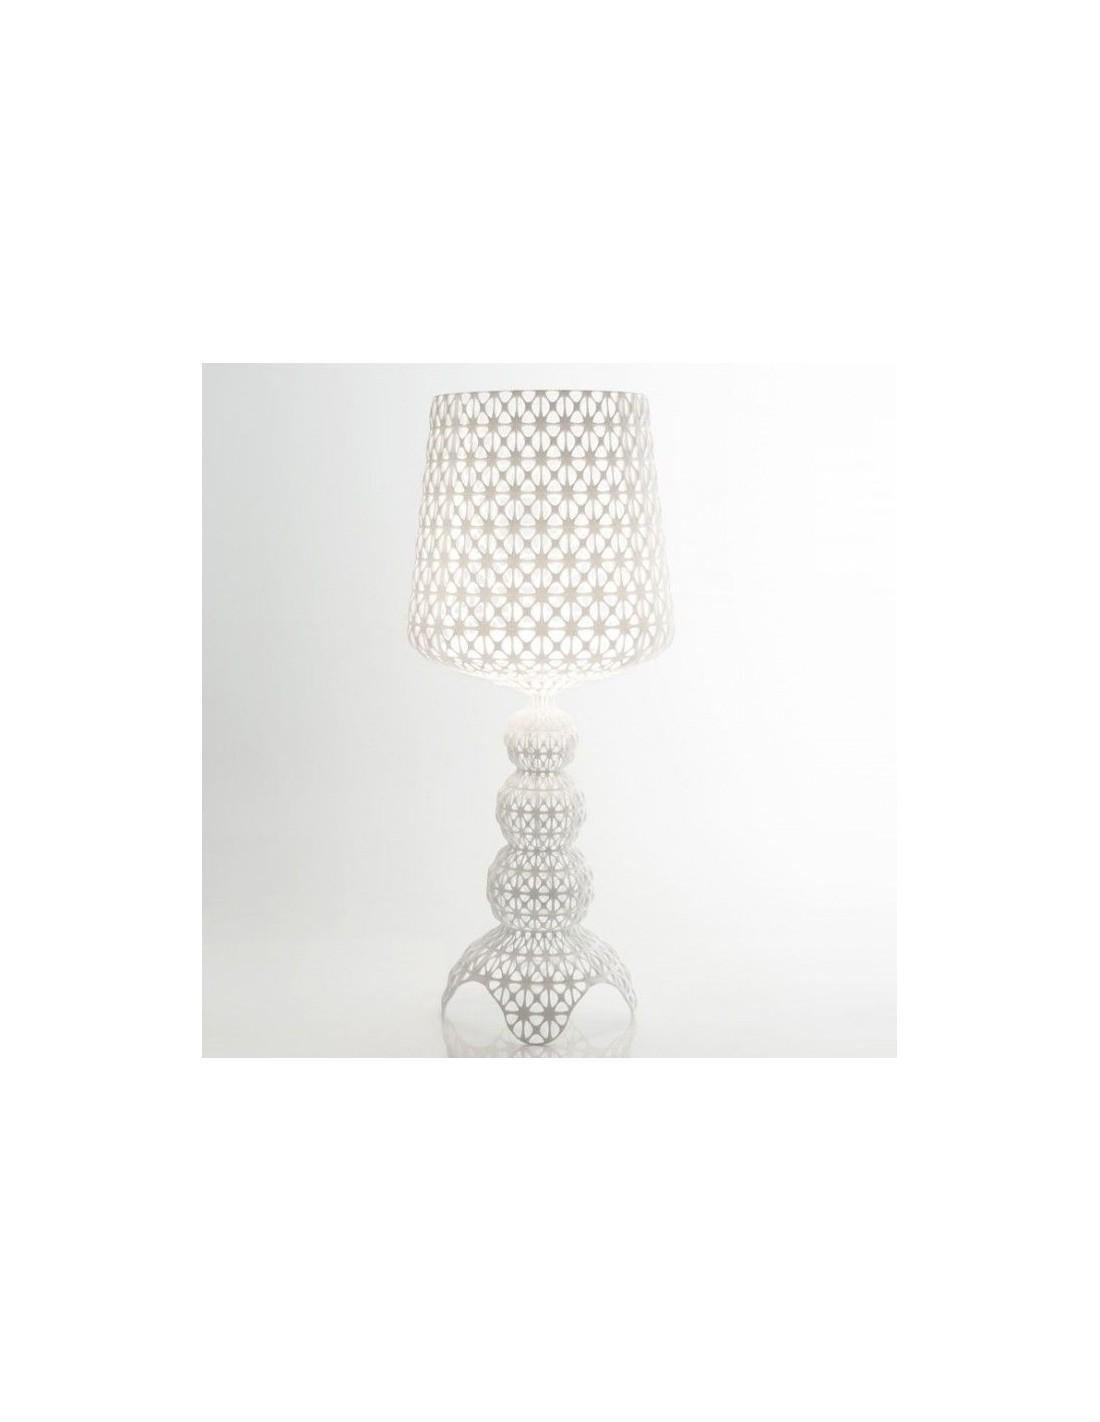 Lampe mini Kabuki noire Kartell - Valente Design